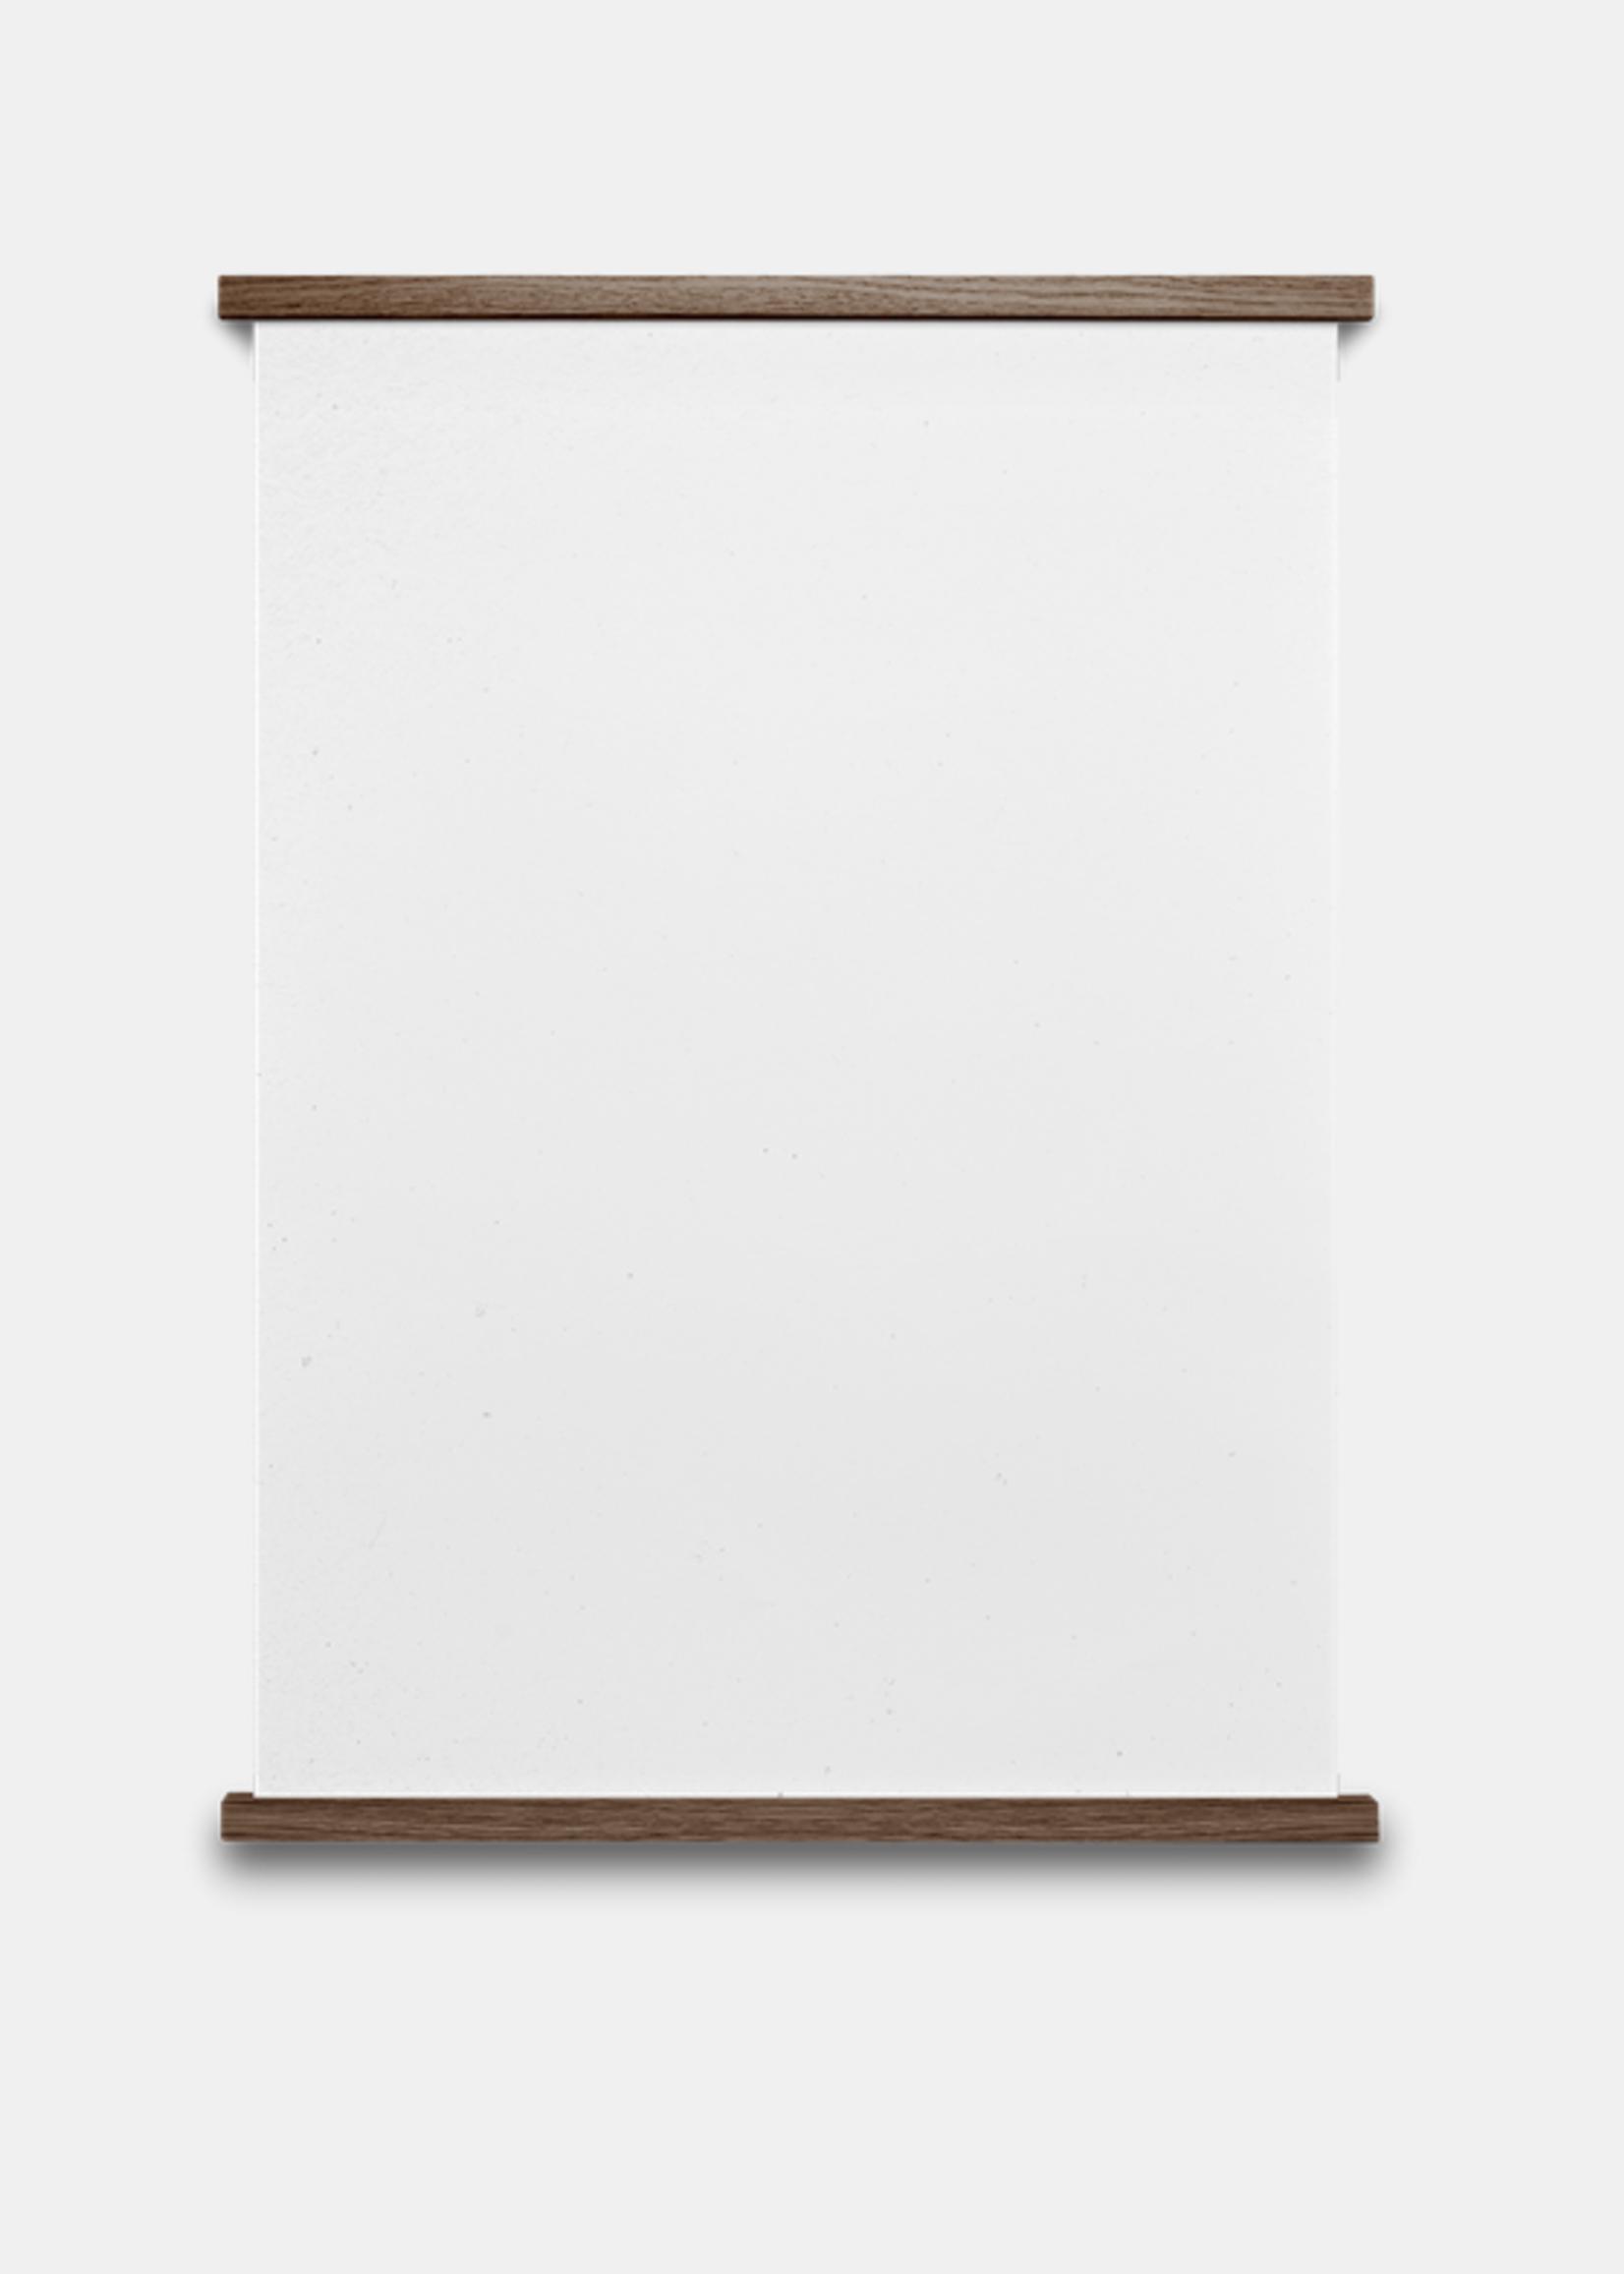 Paper Collective STiiCKS 33 cm